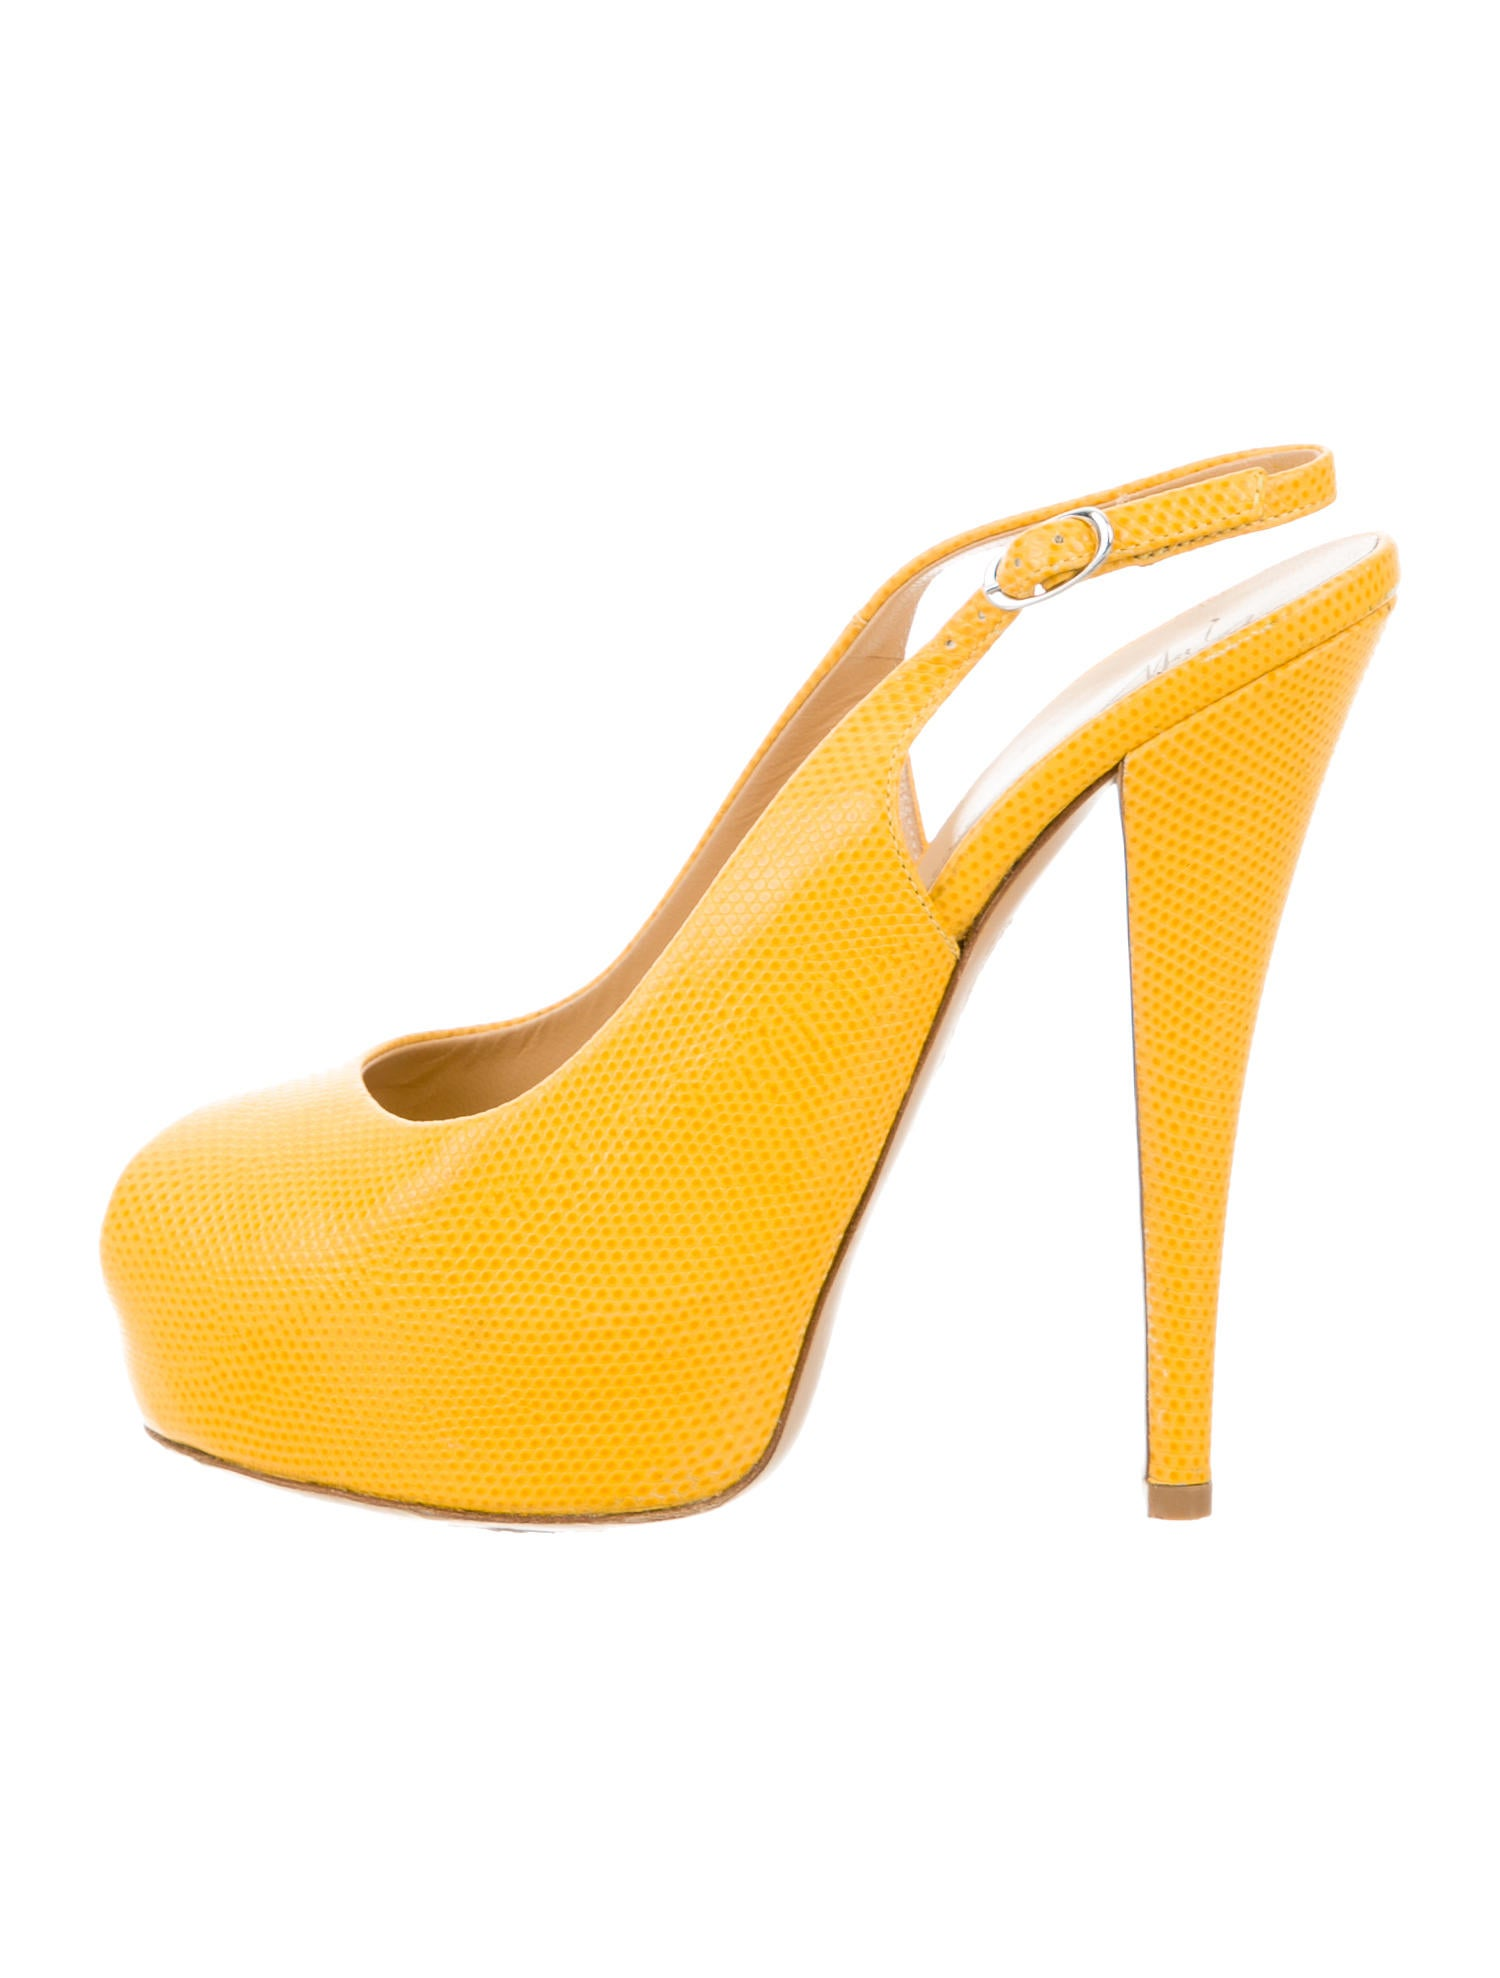 giuseppe zanotti peep toe platform pumps shoes